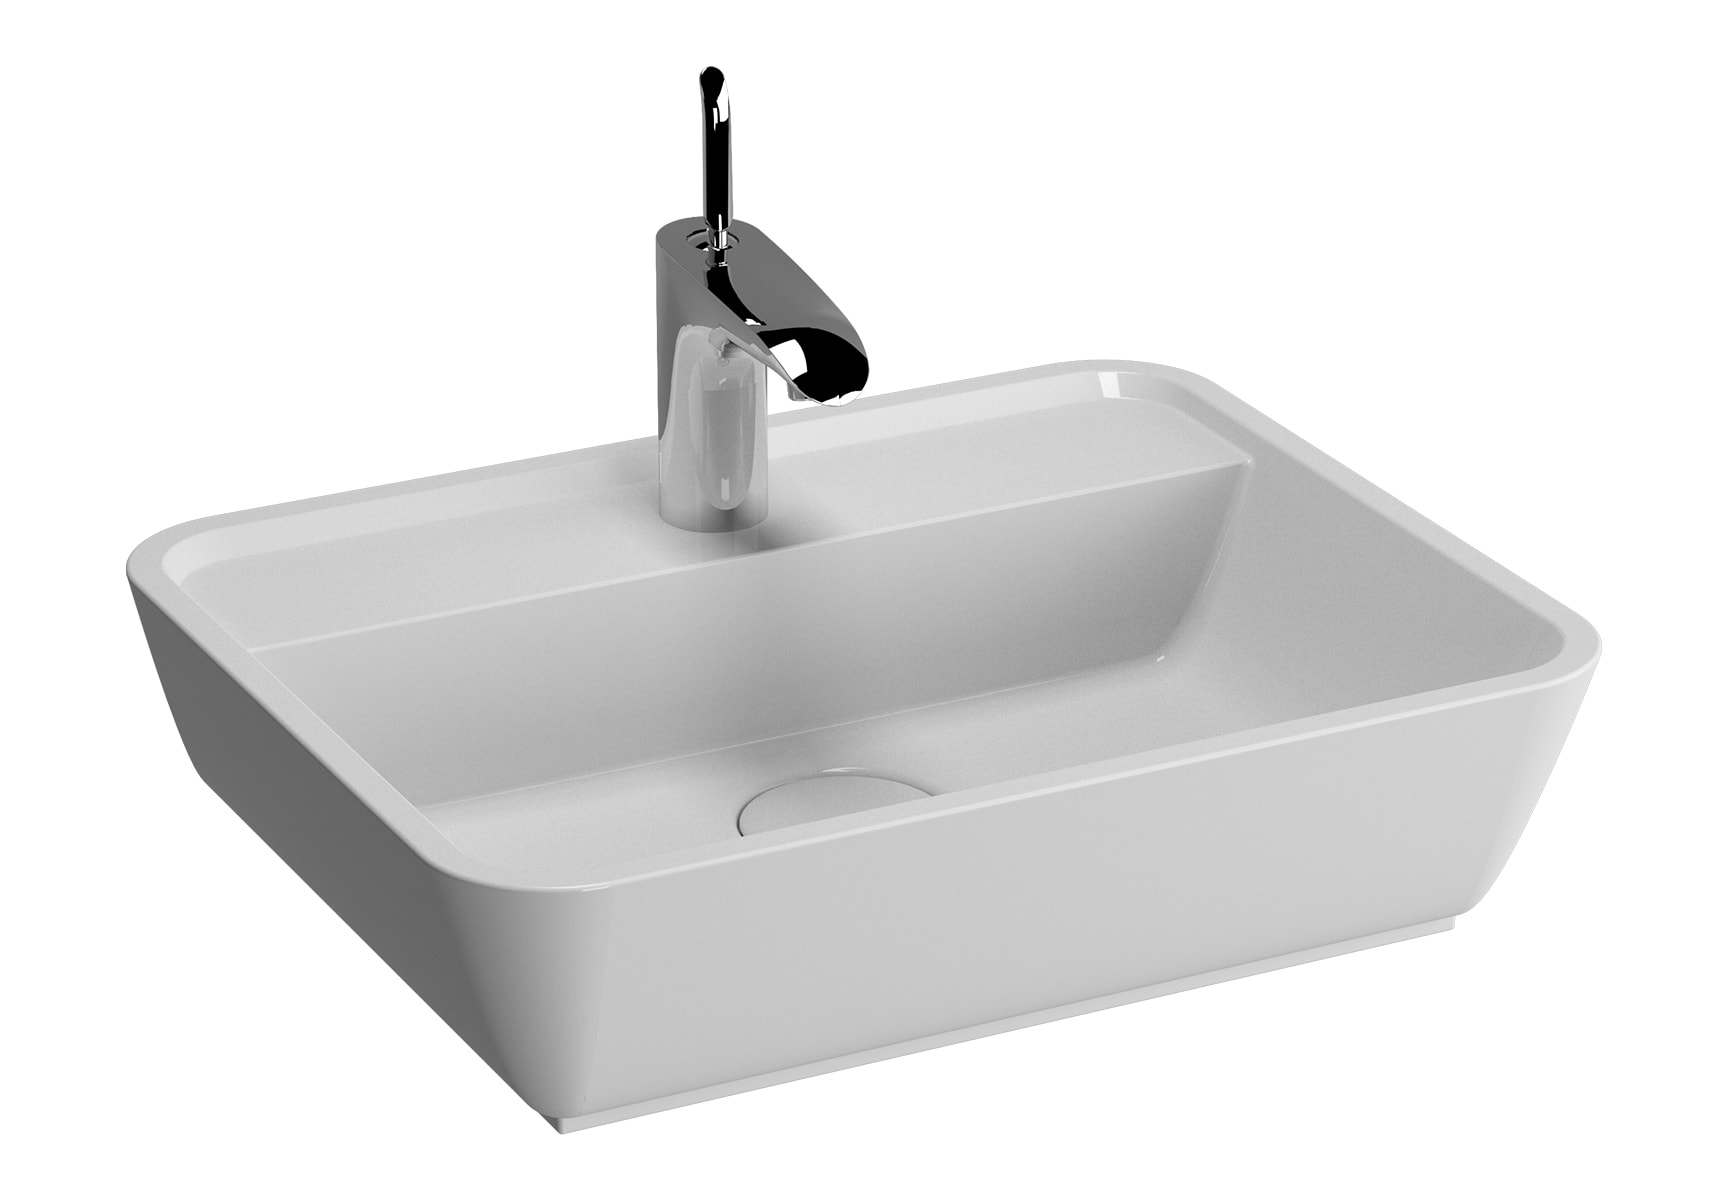 System Infinit Countertop Basin, 51cm